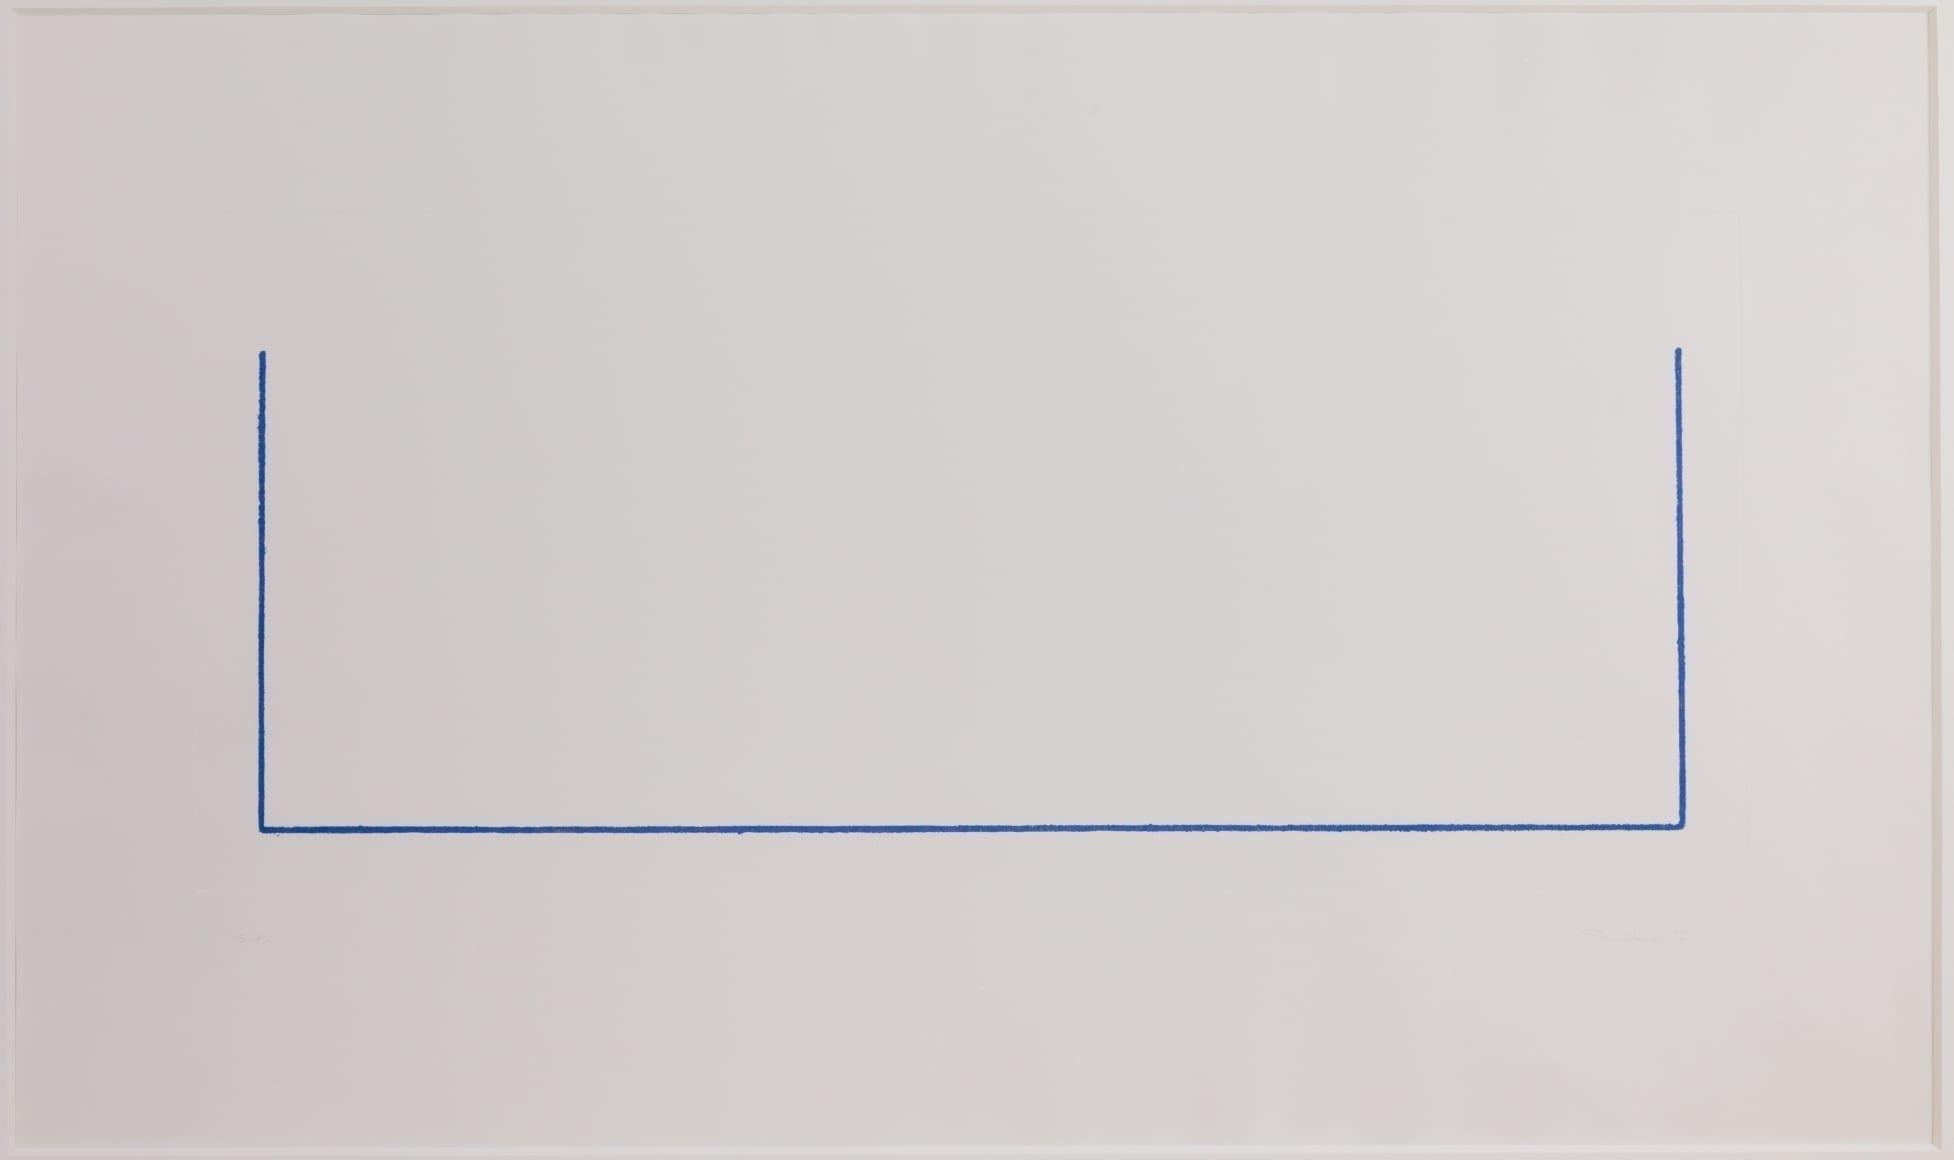 Untitled, 1976 Medium: Etching